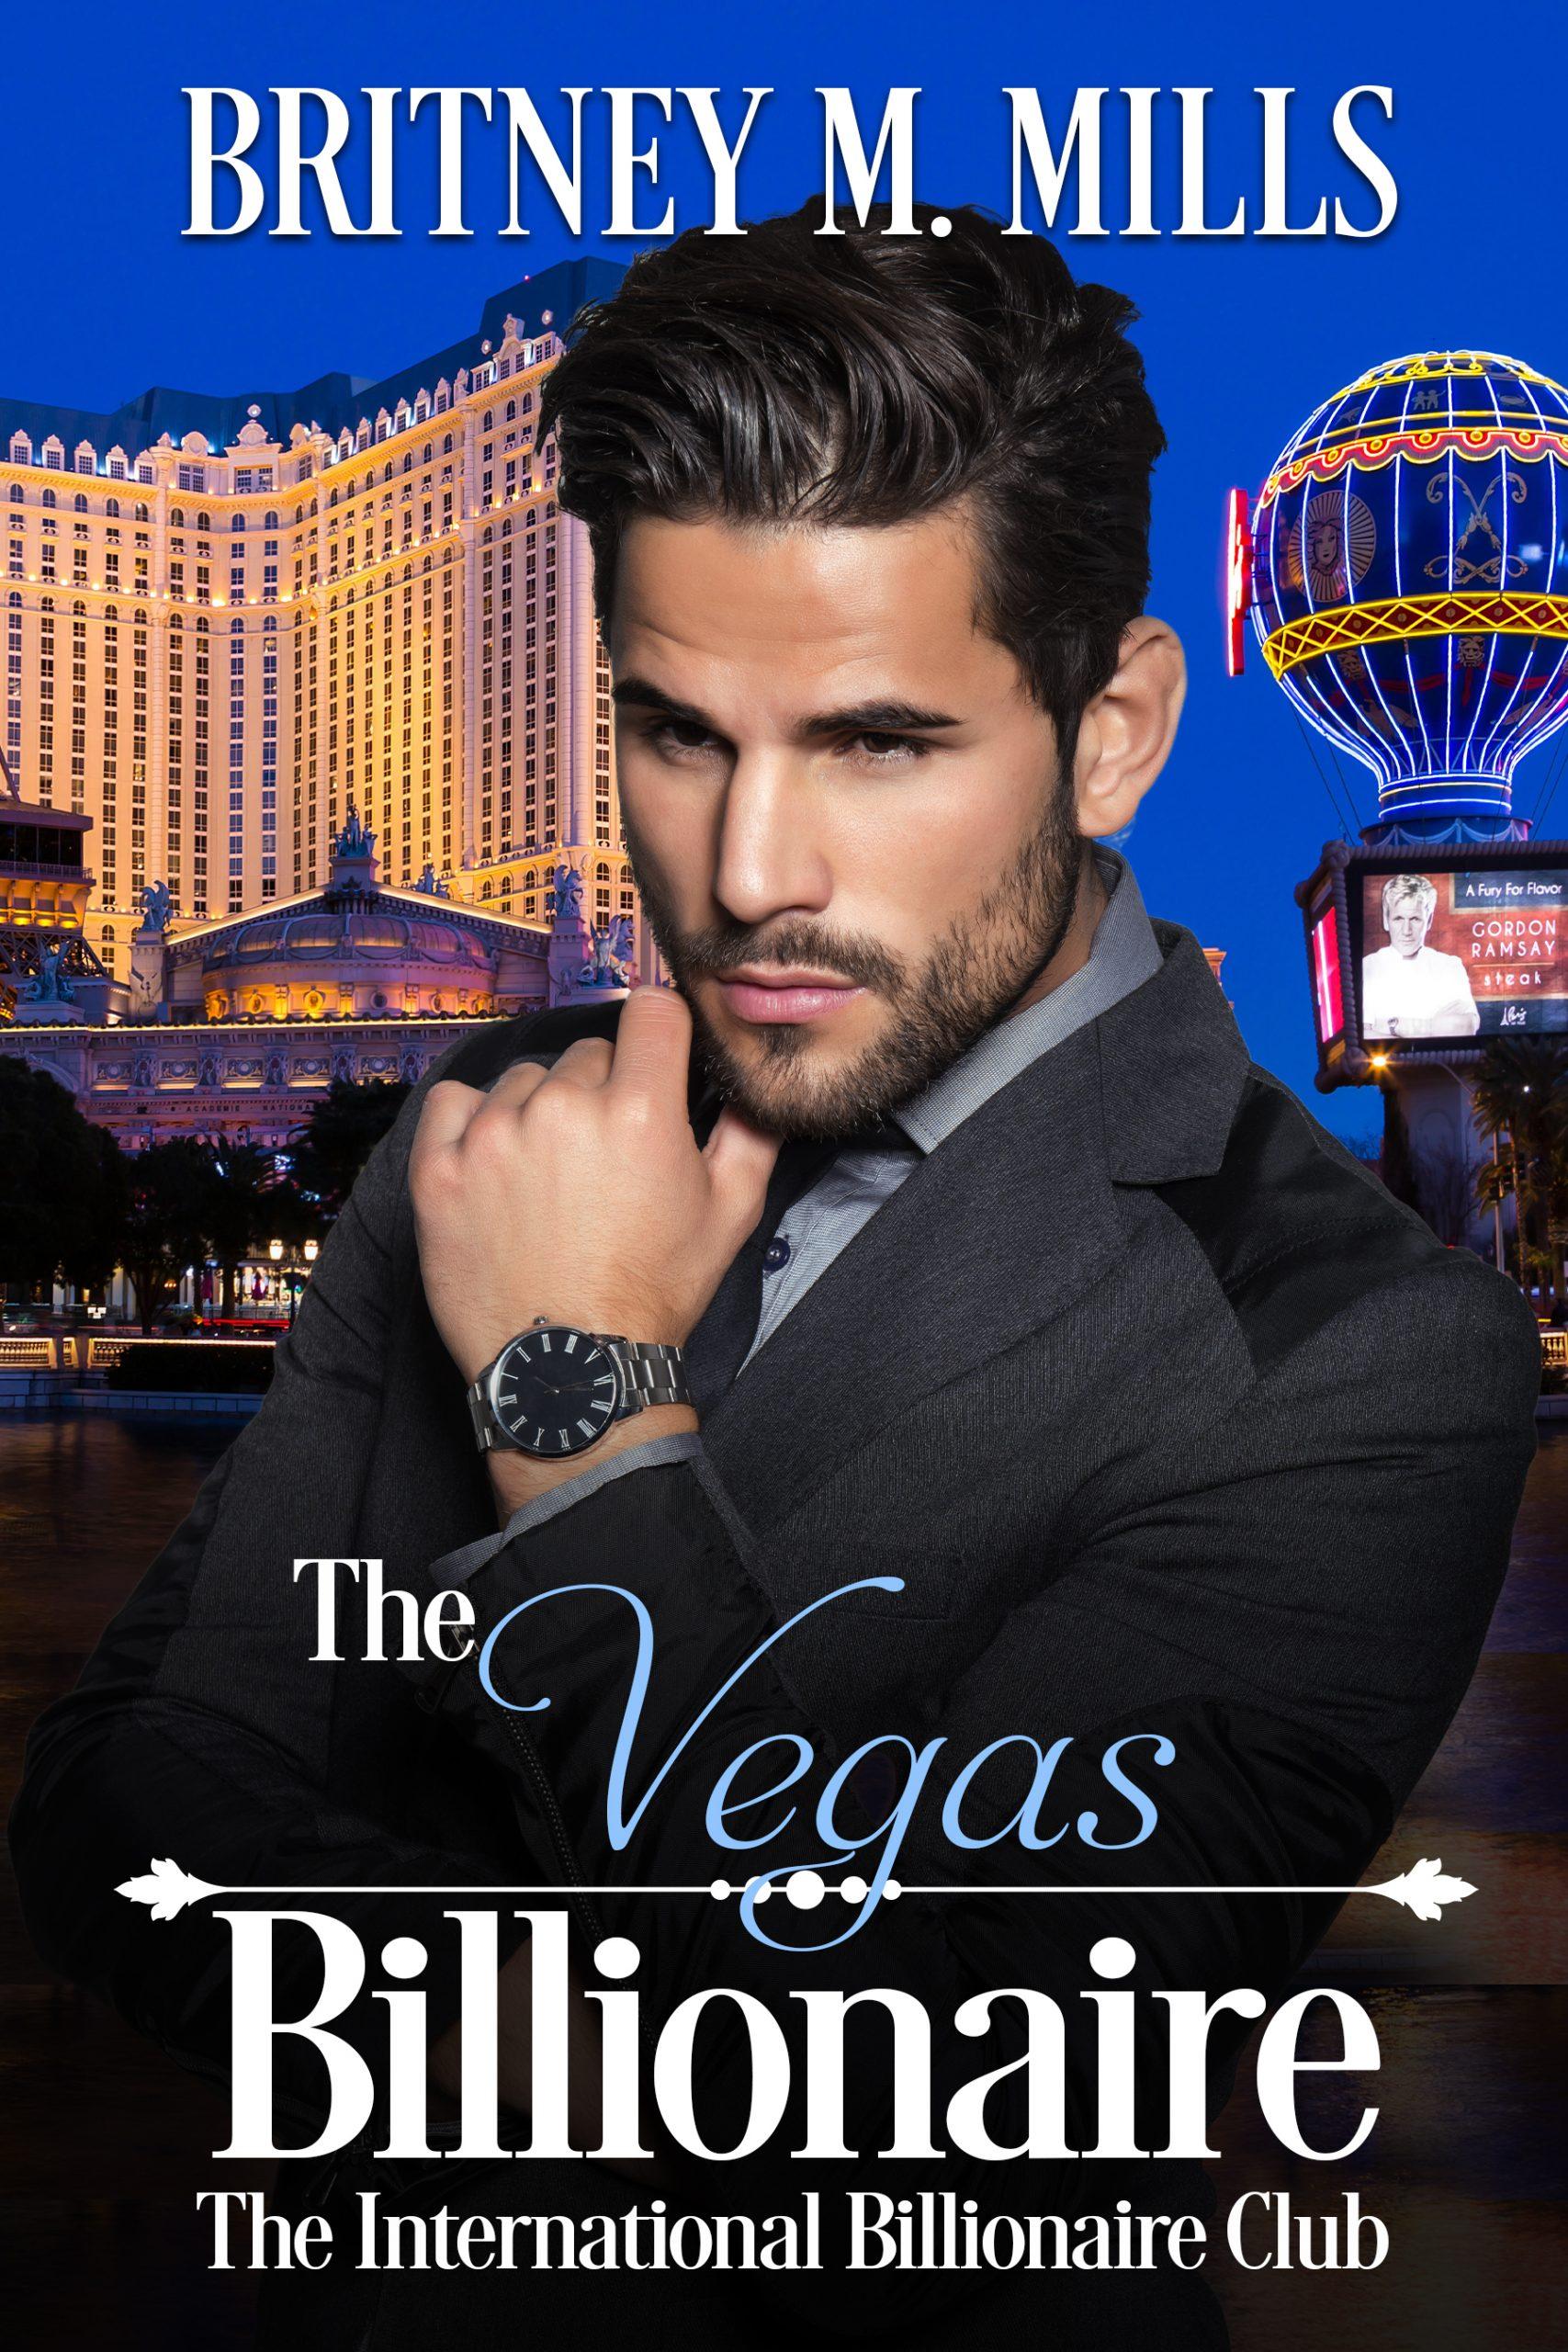 The Vegas Billionaire by Britney M. Mills l International Billionaire Club Series